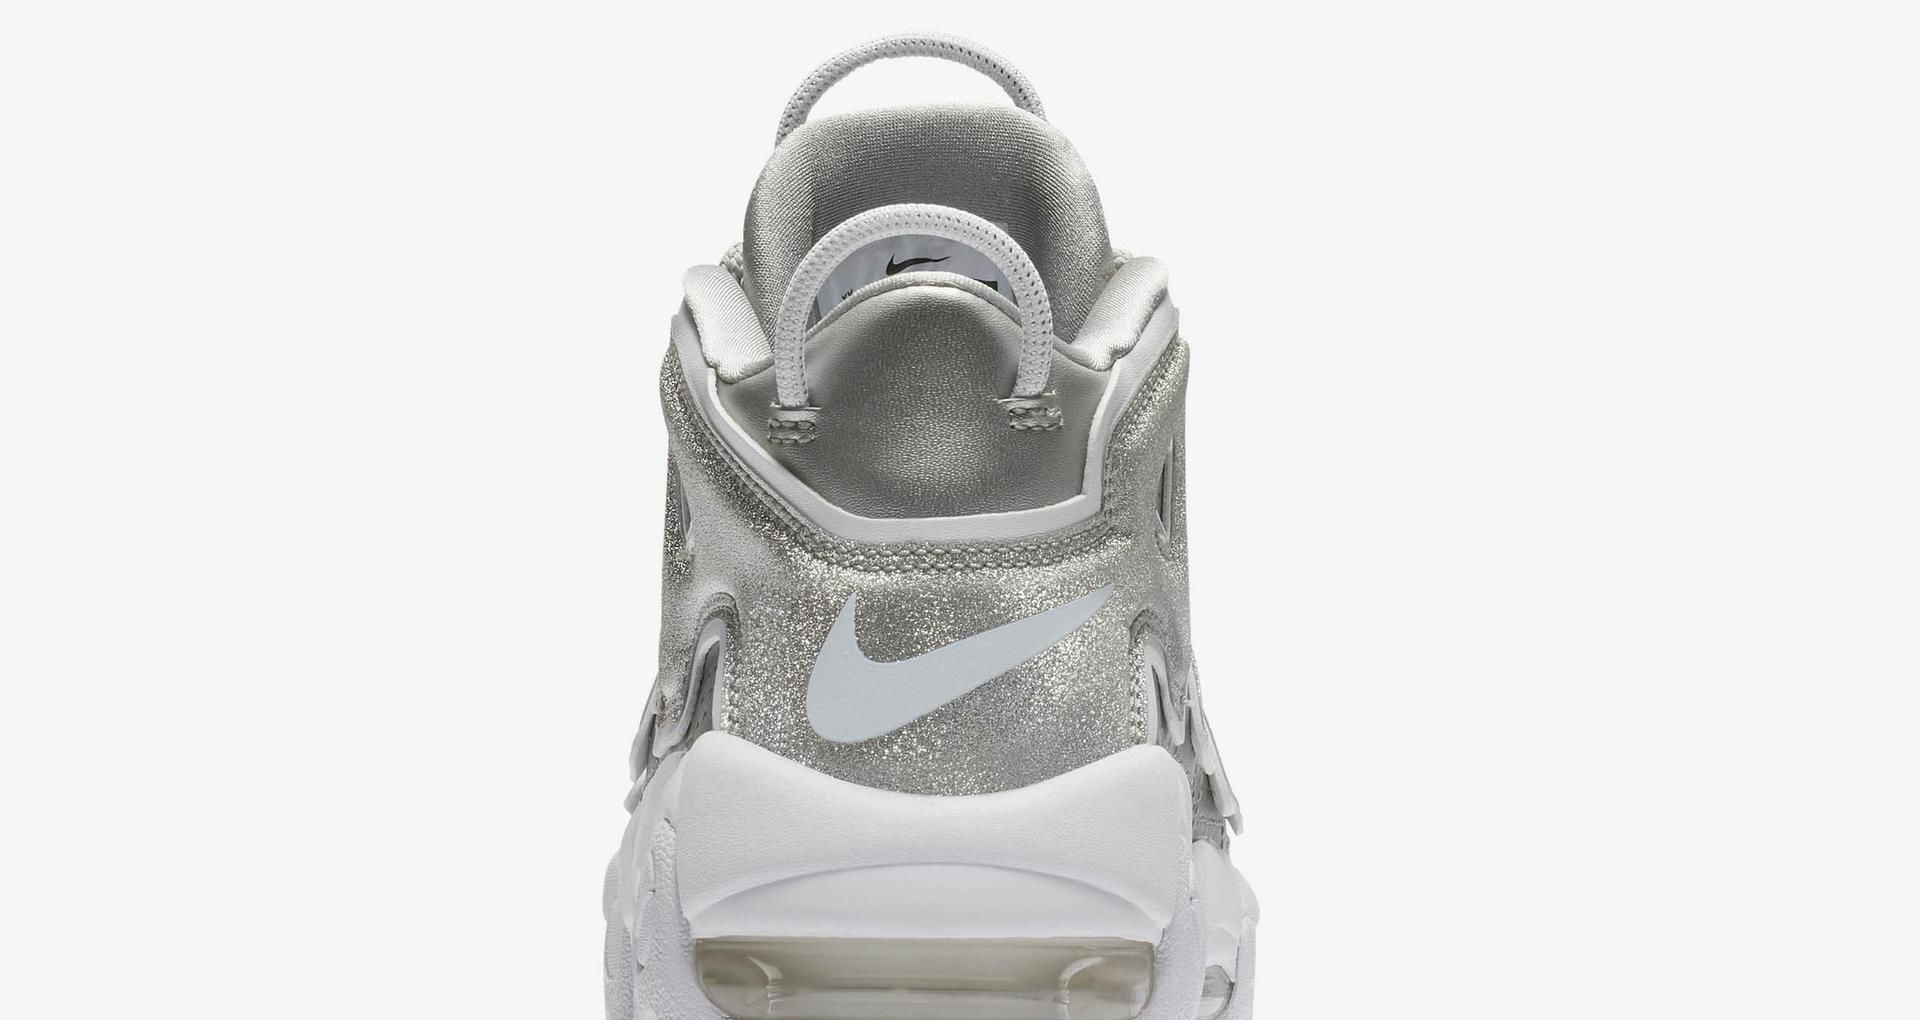 4c9152c6fd84 Women s Nike Air More Uptempo  Metallic Silver   White  Release Date ...